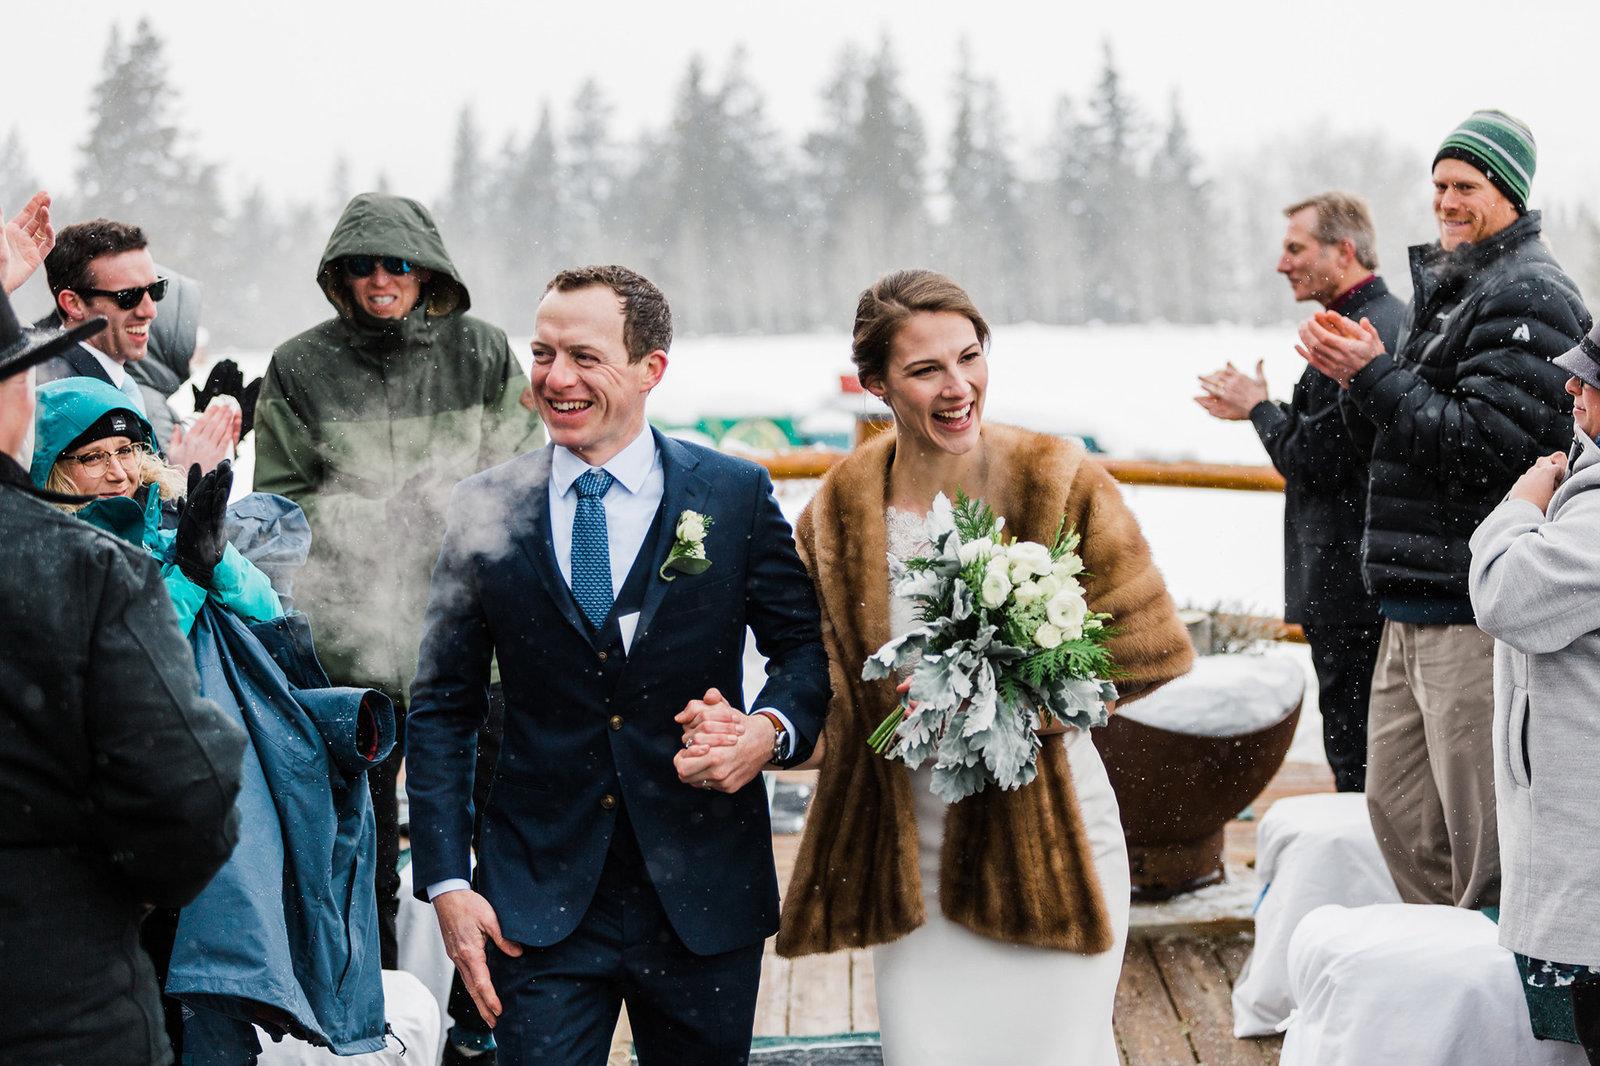 jackson-hole-elopement-photographer-amy-galbraith-winter-wedding-triangle-x